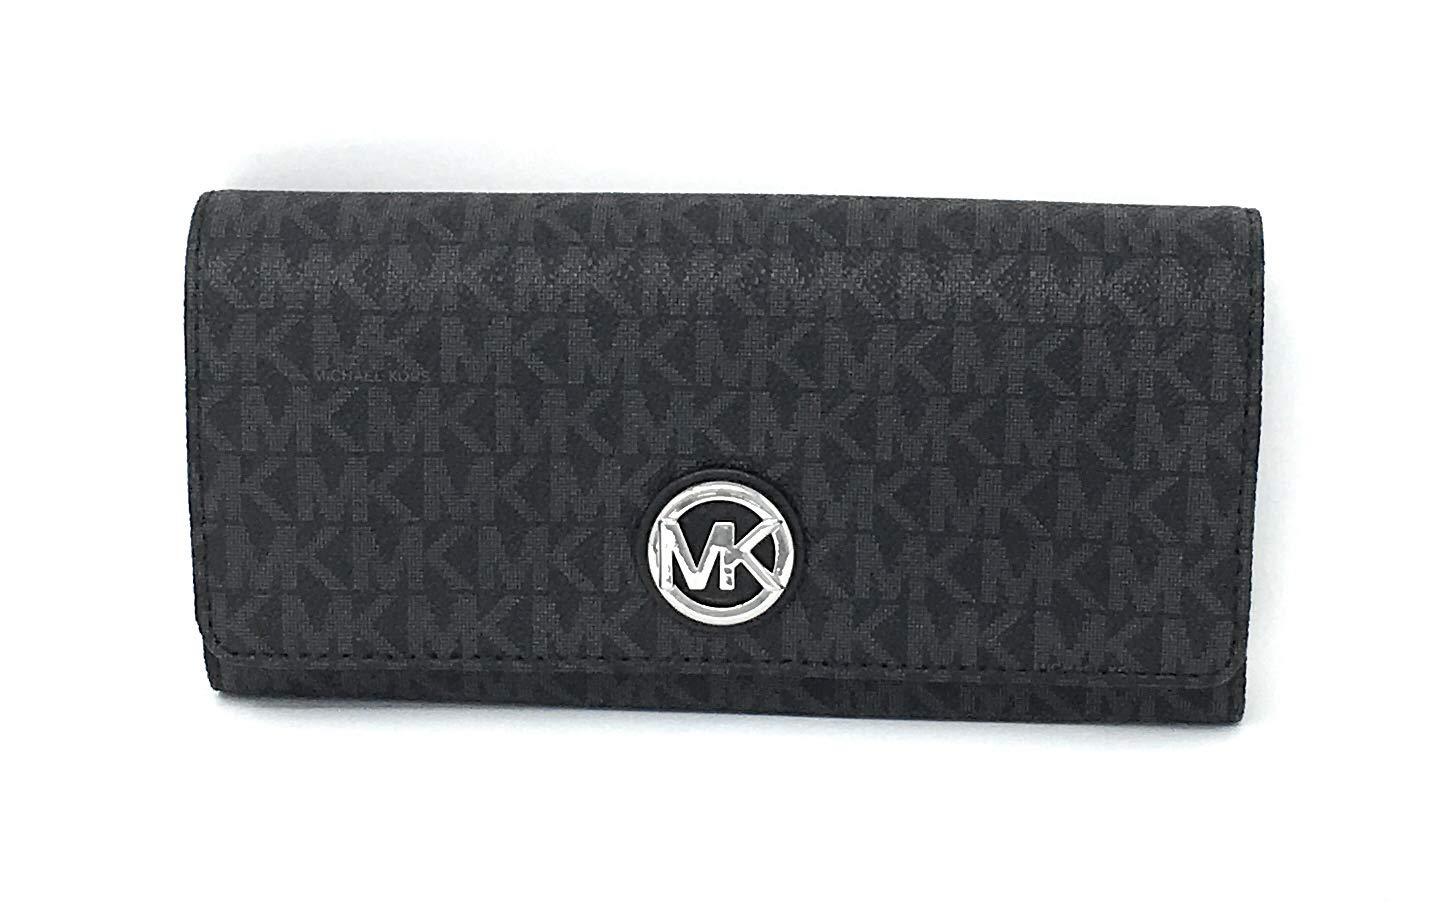 Michael Kors Signature PVC Fulton Flap Continental Wallet- Black